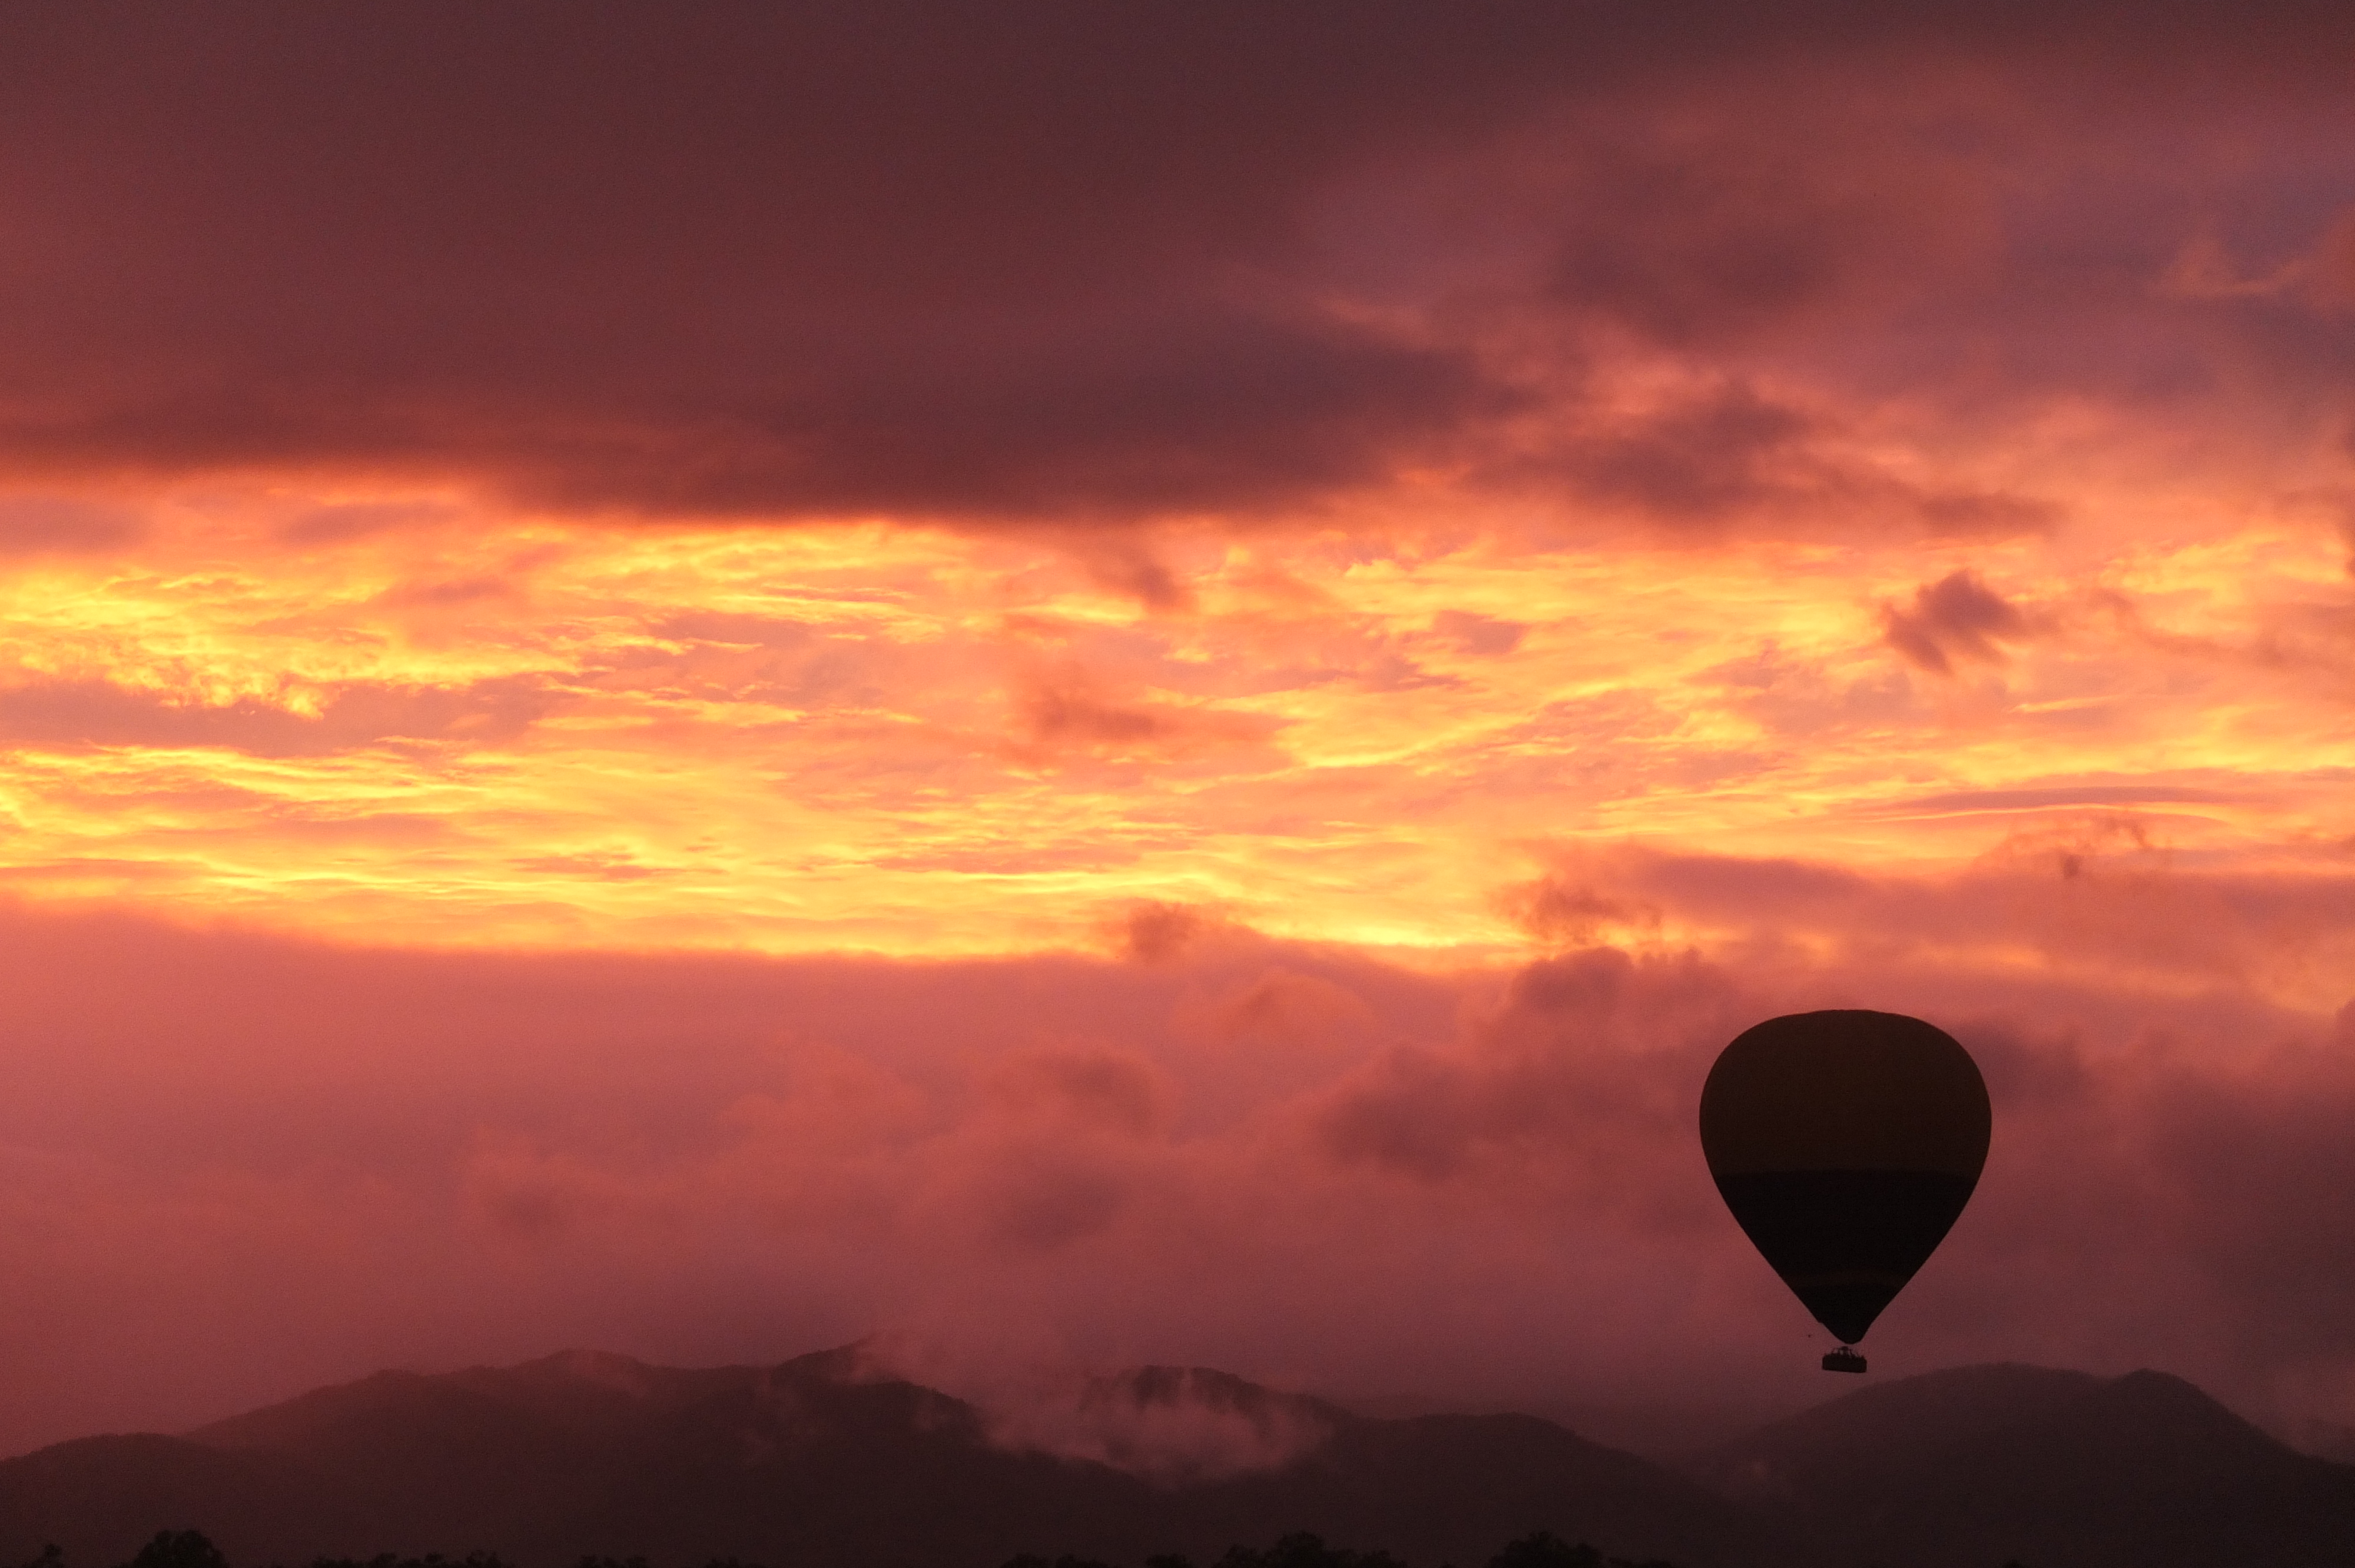 凯恩斯高地  Cairns Highlands   -3